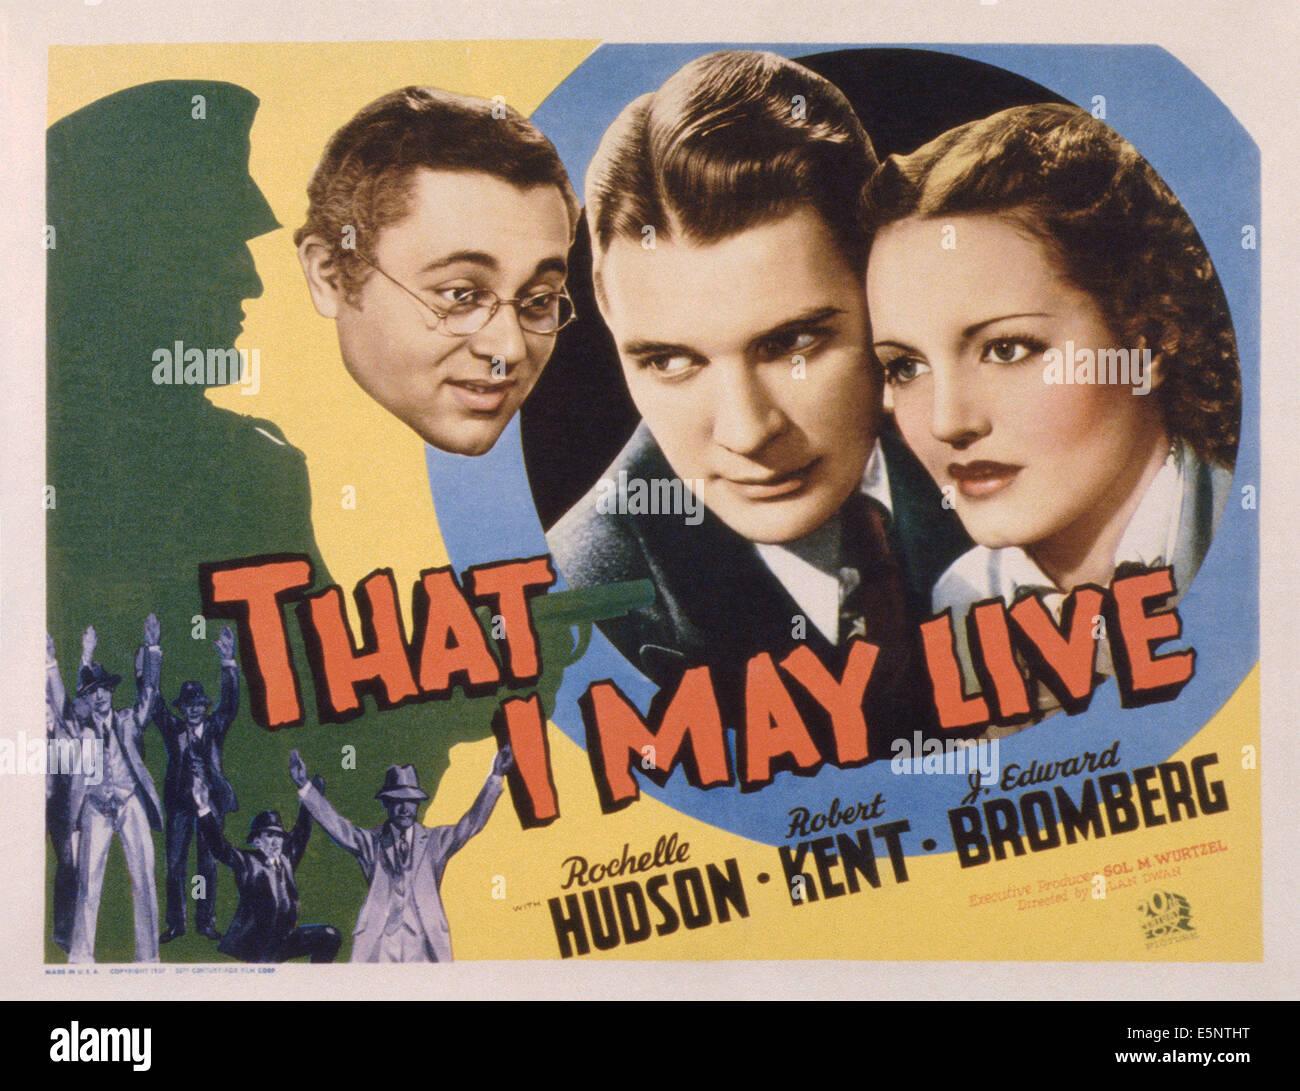 DASS ich lebe, US Lobbycard, von links: J. Edward Bromberg, Robert Kent, Rochelle Hudson, 1937. TM & Copyright Stockbild